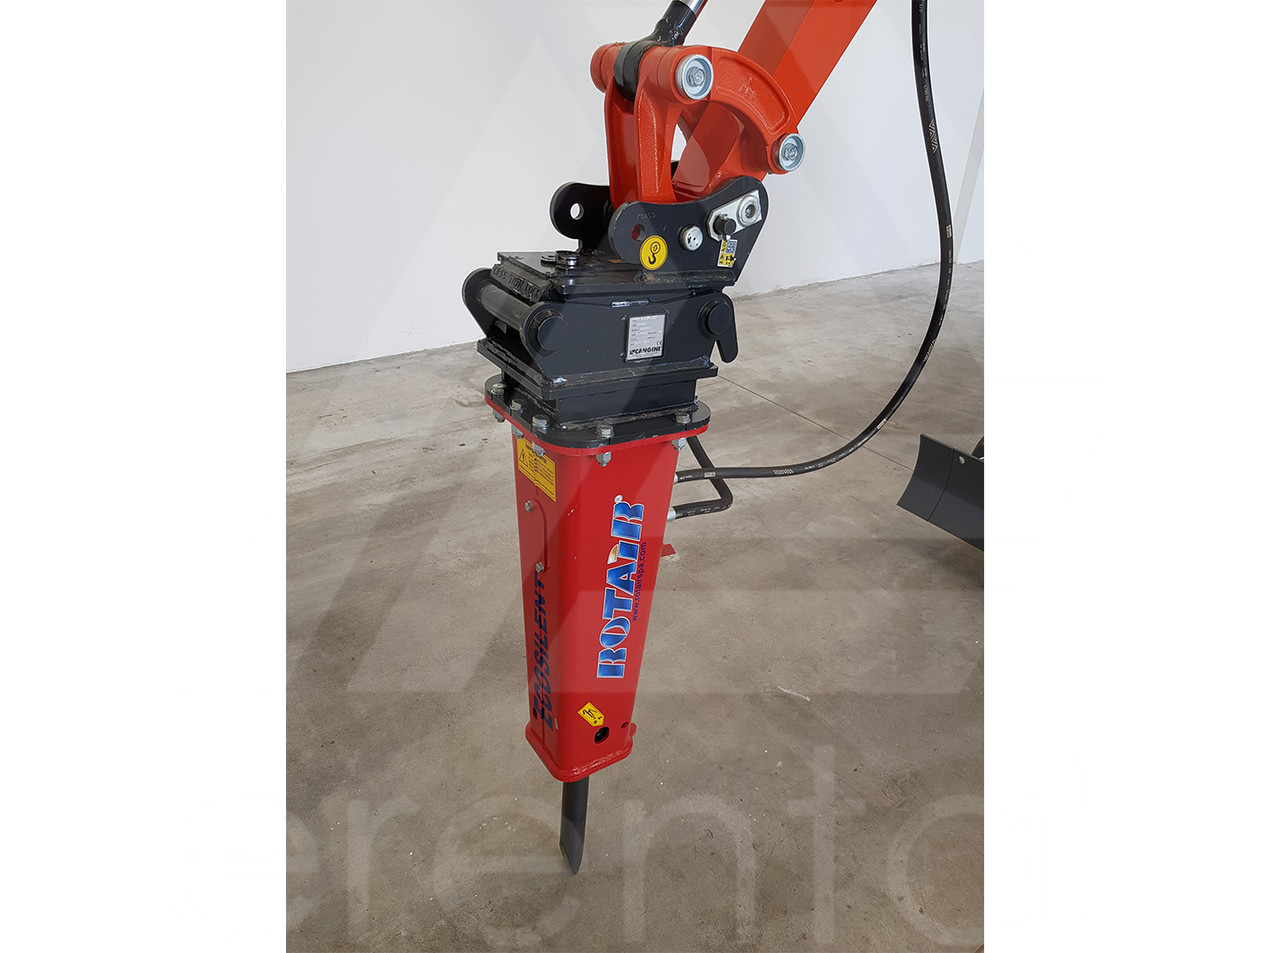 Martello idraulico ROTAIR OLS-95